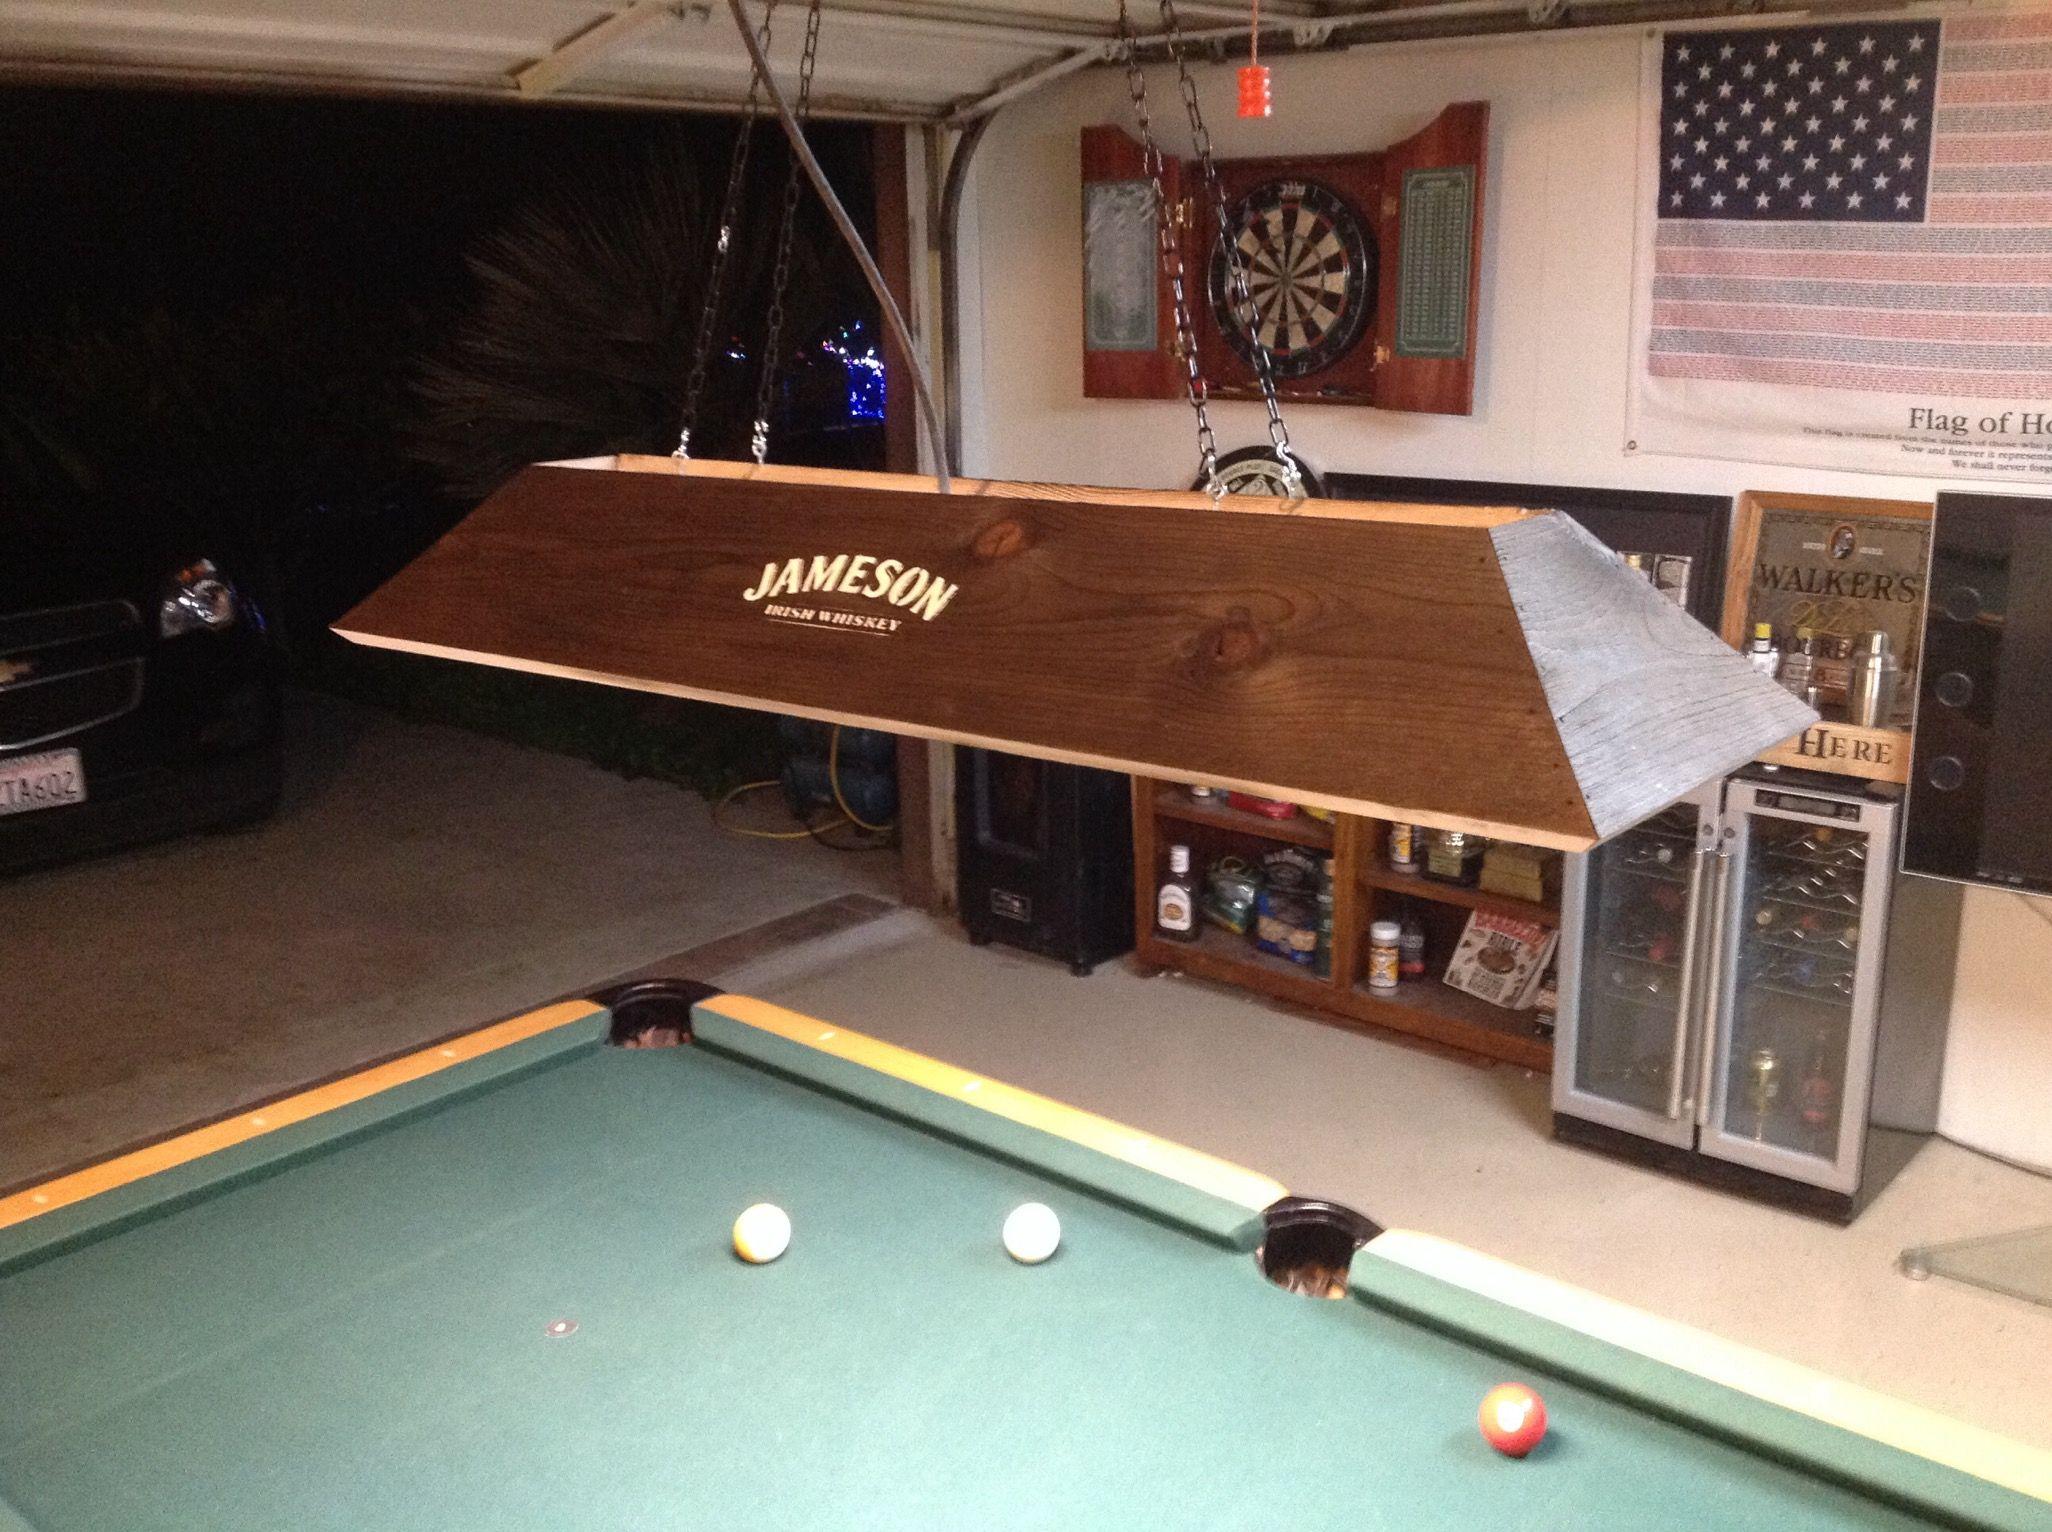 Jameson Irish Whiskey Pool Table Light